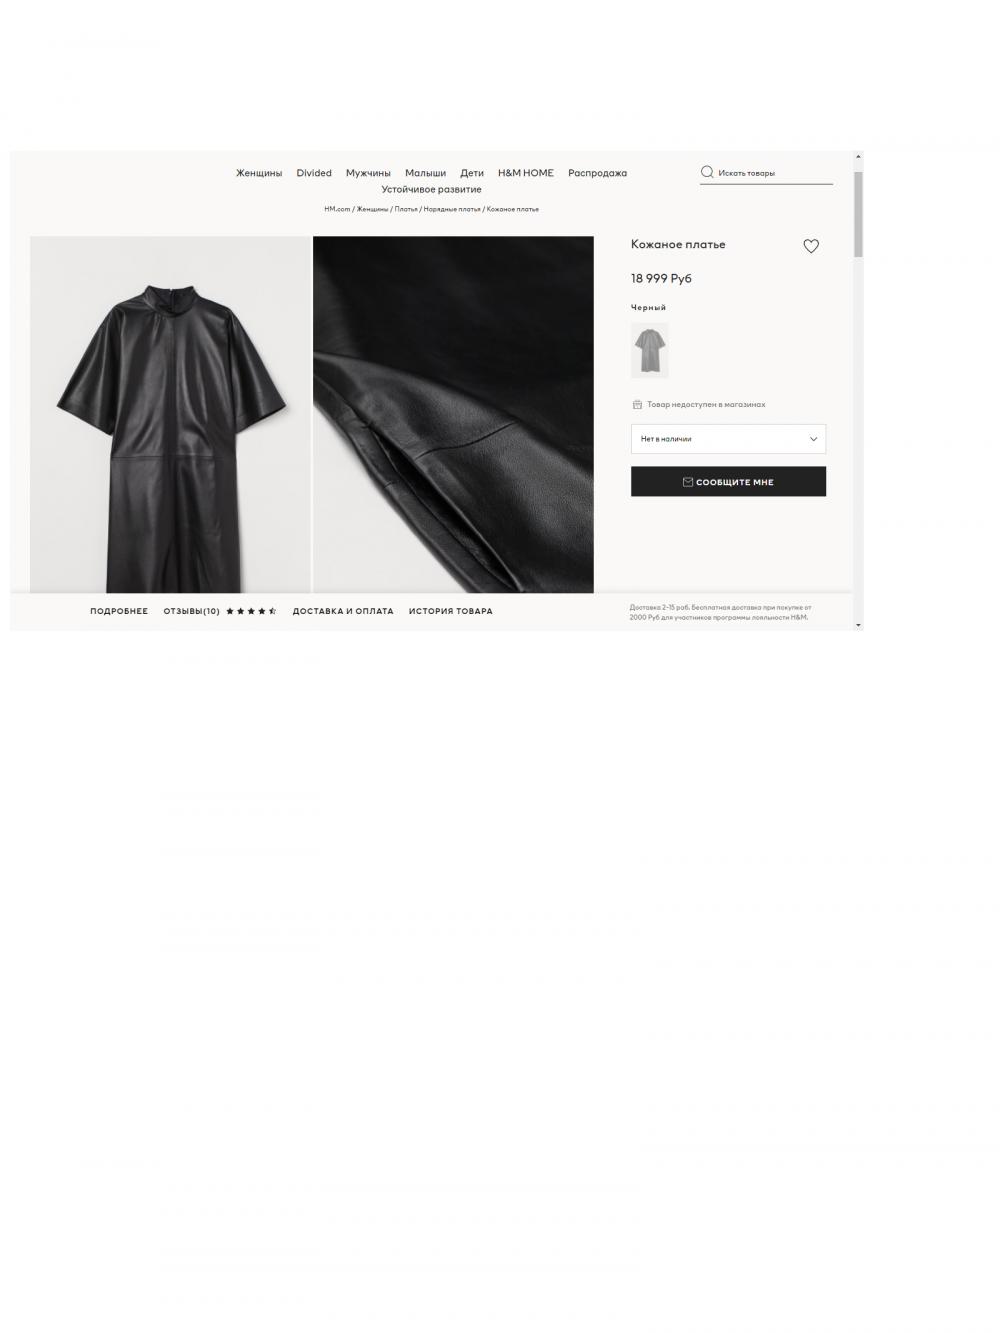 Кожаное платье H&M, размер S